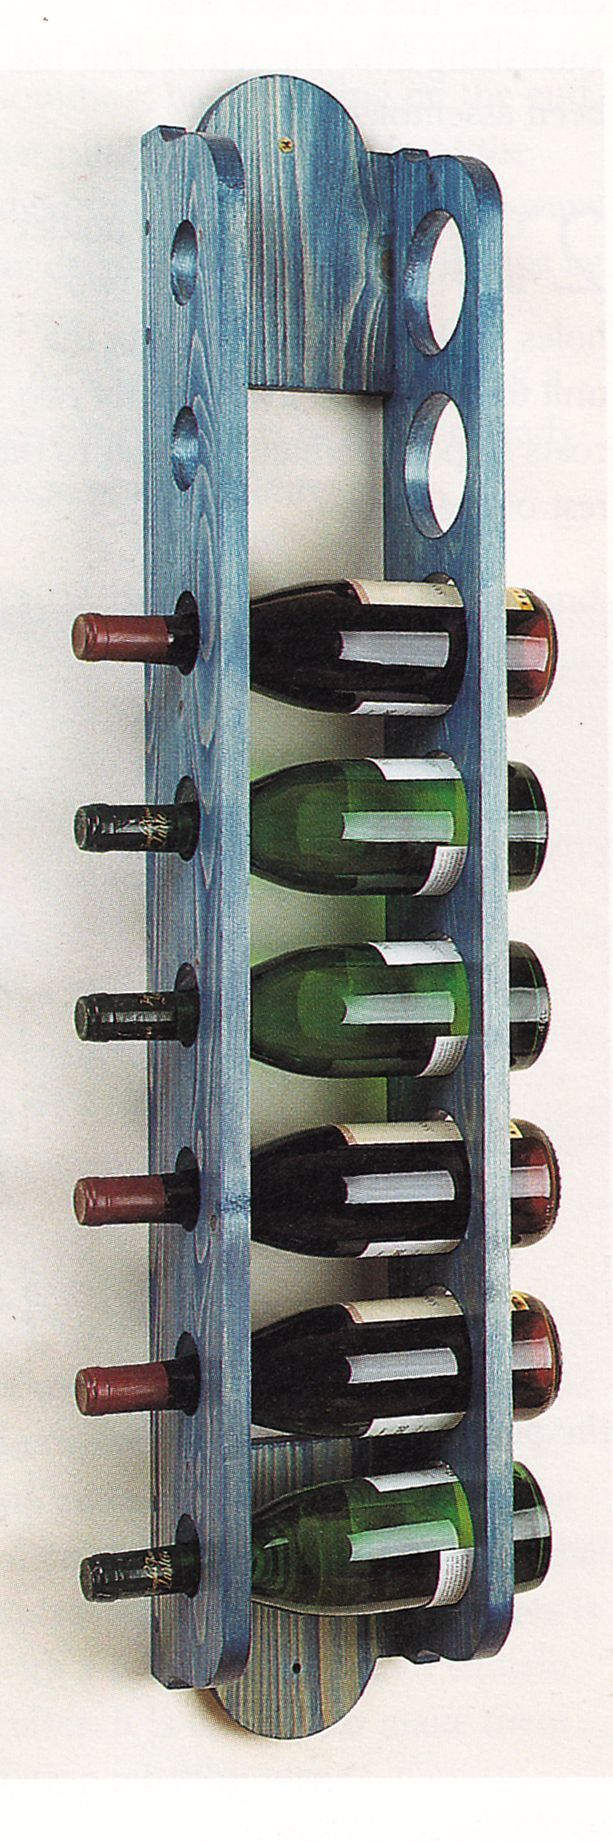 Best 25+ Wine rack plans ideas on Pinterest | Build a wine rack, Wine rack  design and Wine racks